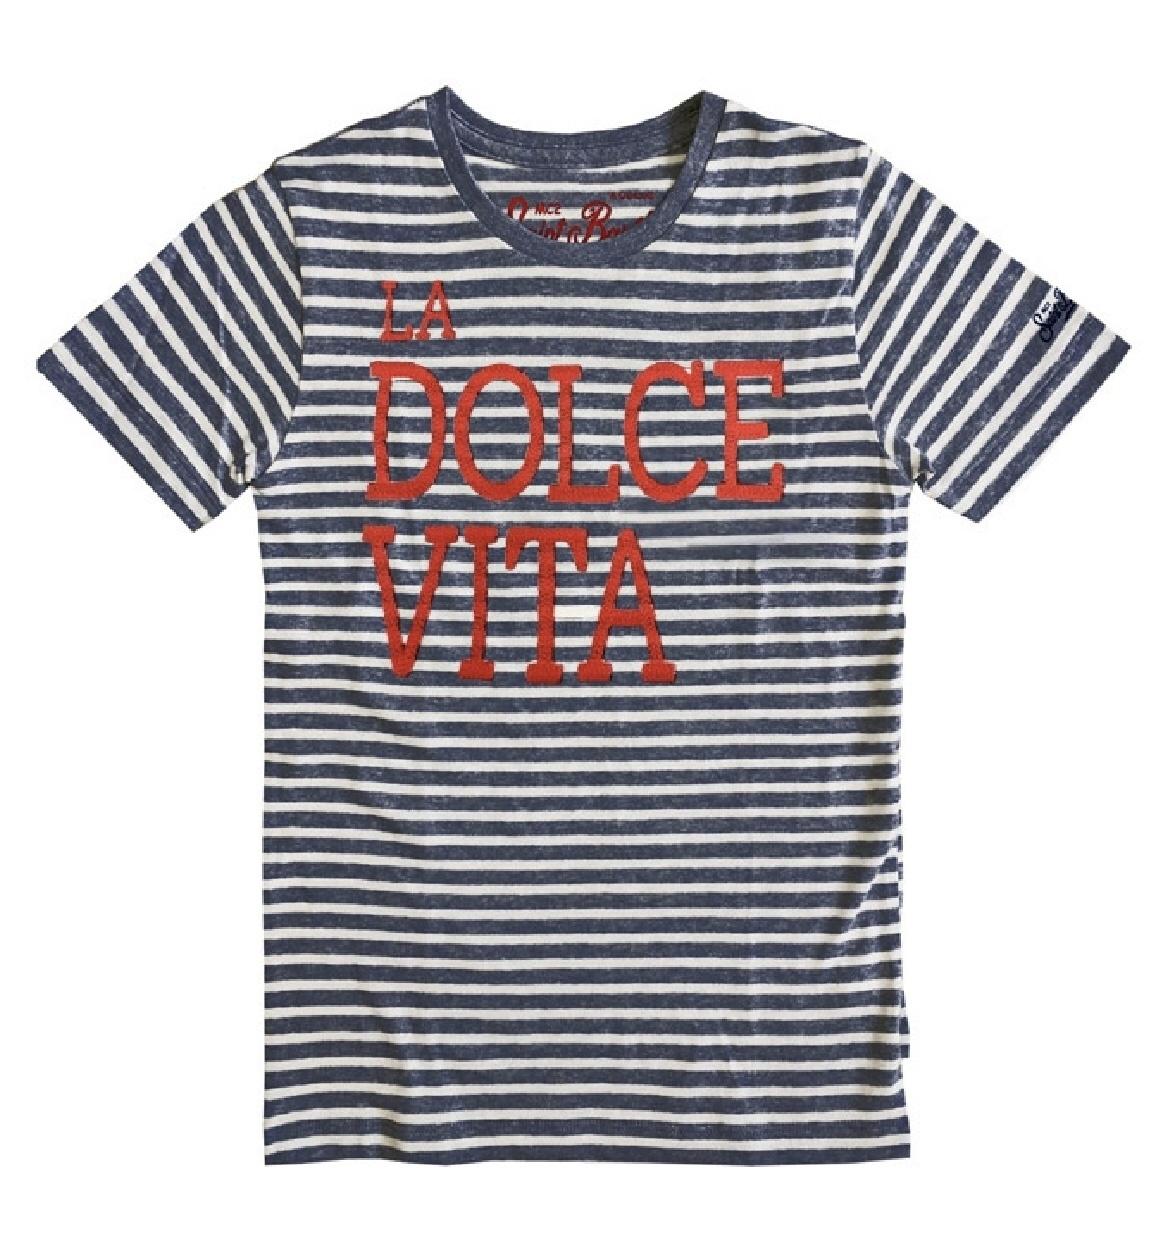 La Dolce Vita T-Shirt-1